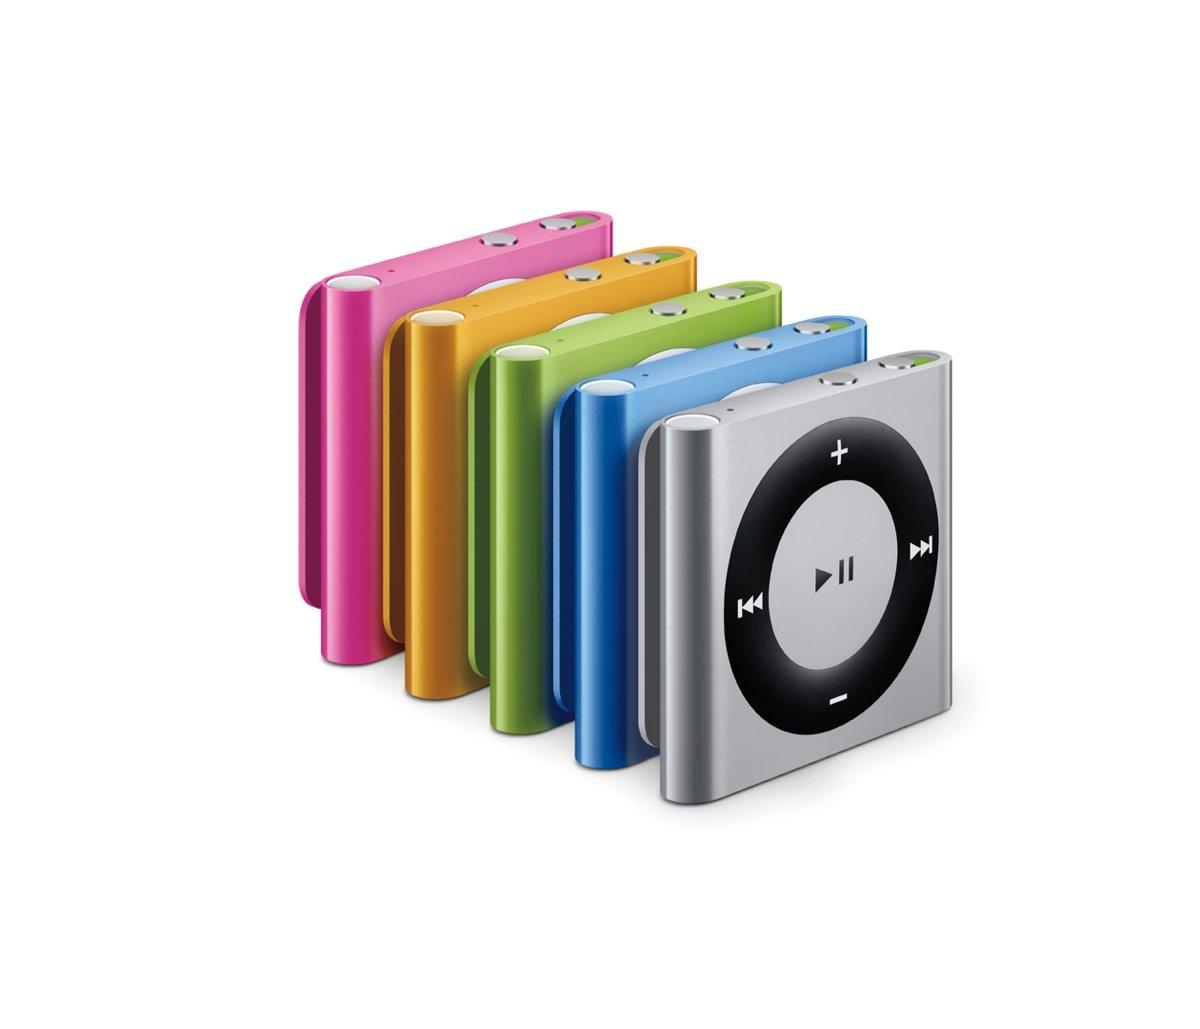 iPod shuffle: Farbvarianten